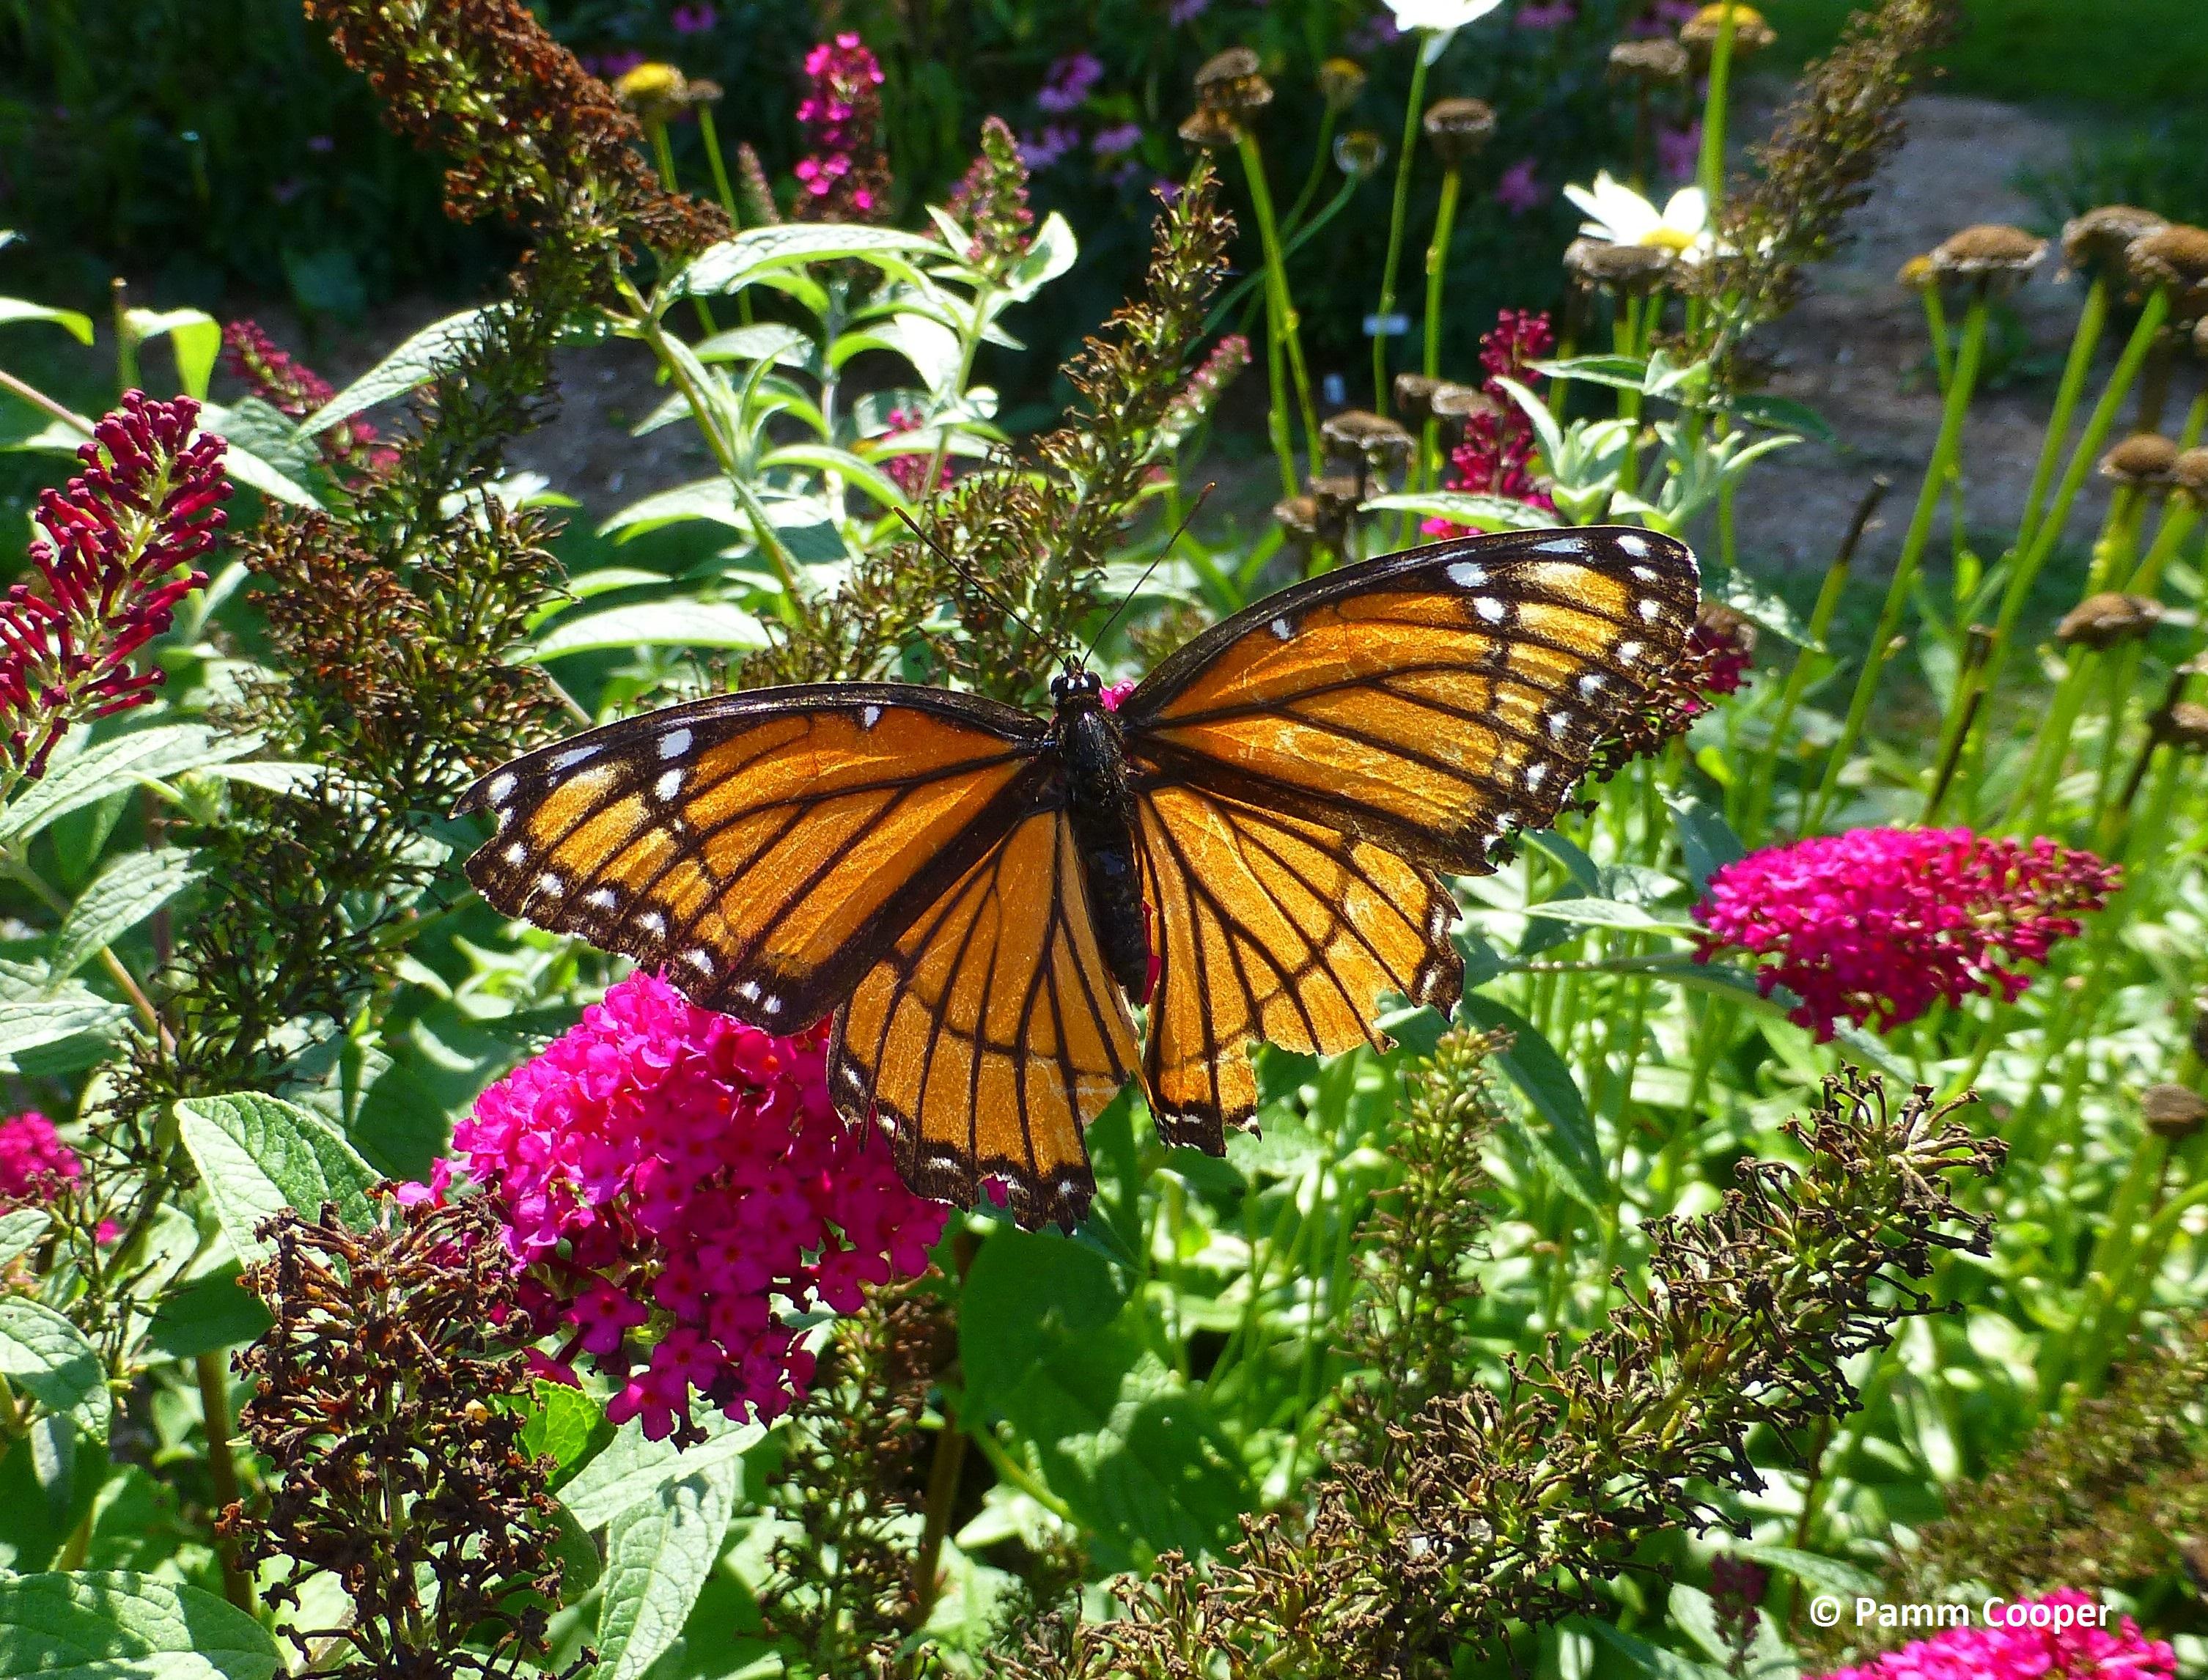 Viceroy butterfly on 'Miss Molly' butterfly bush September 2017